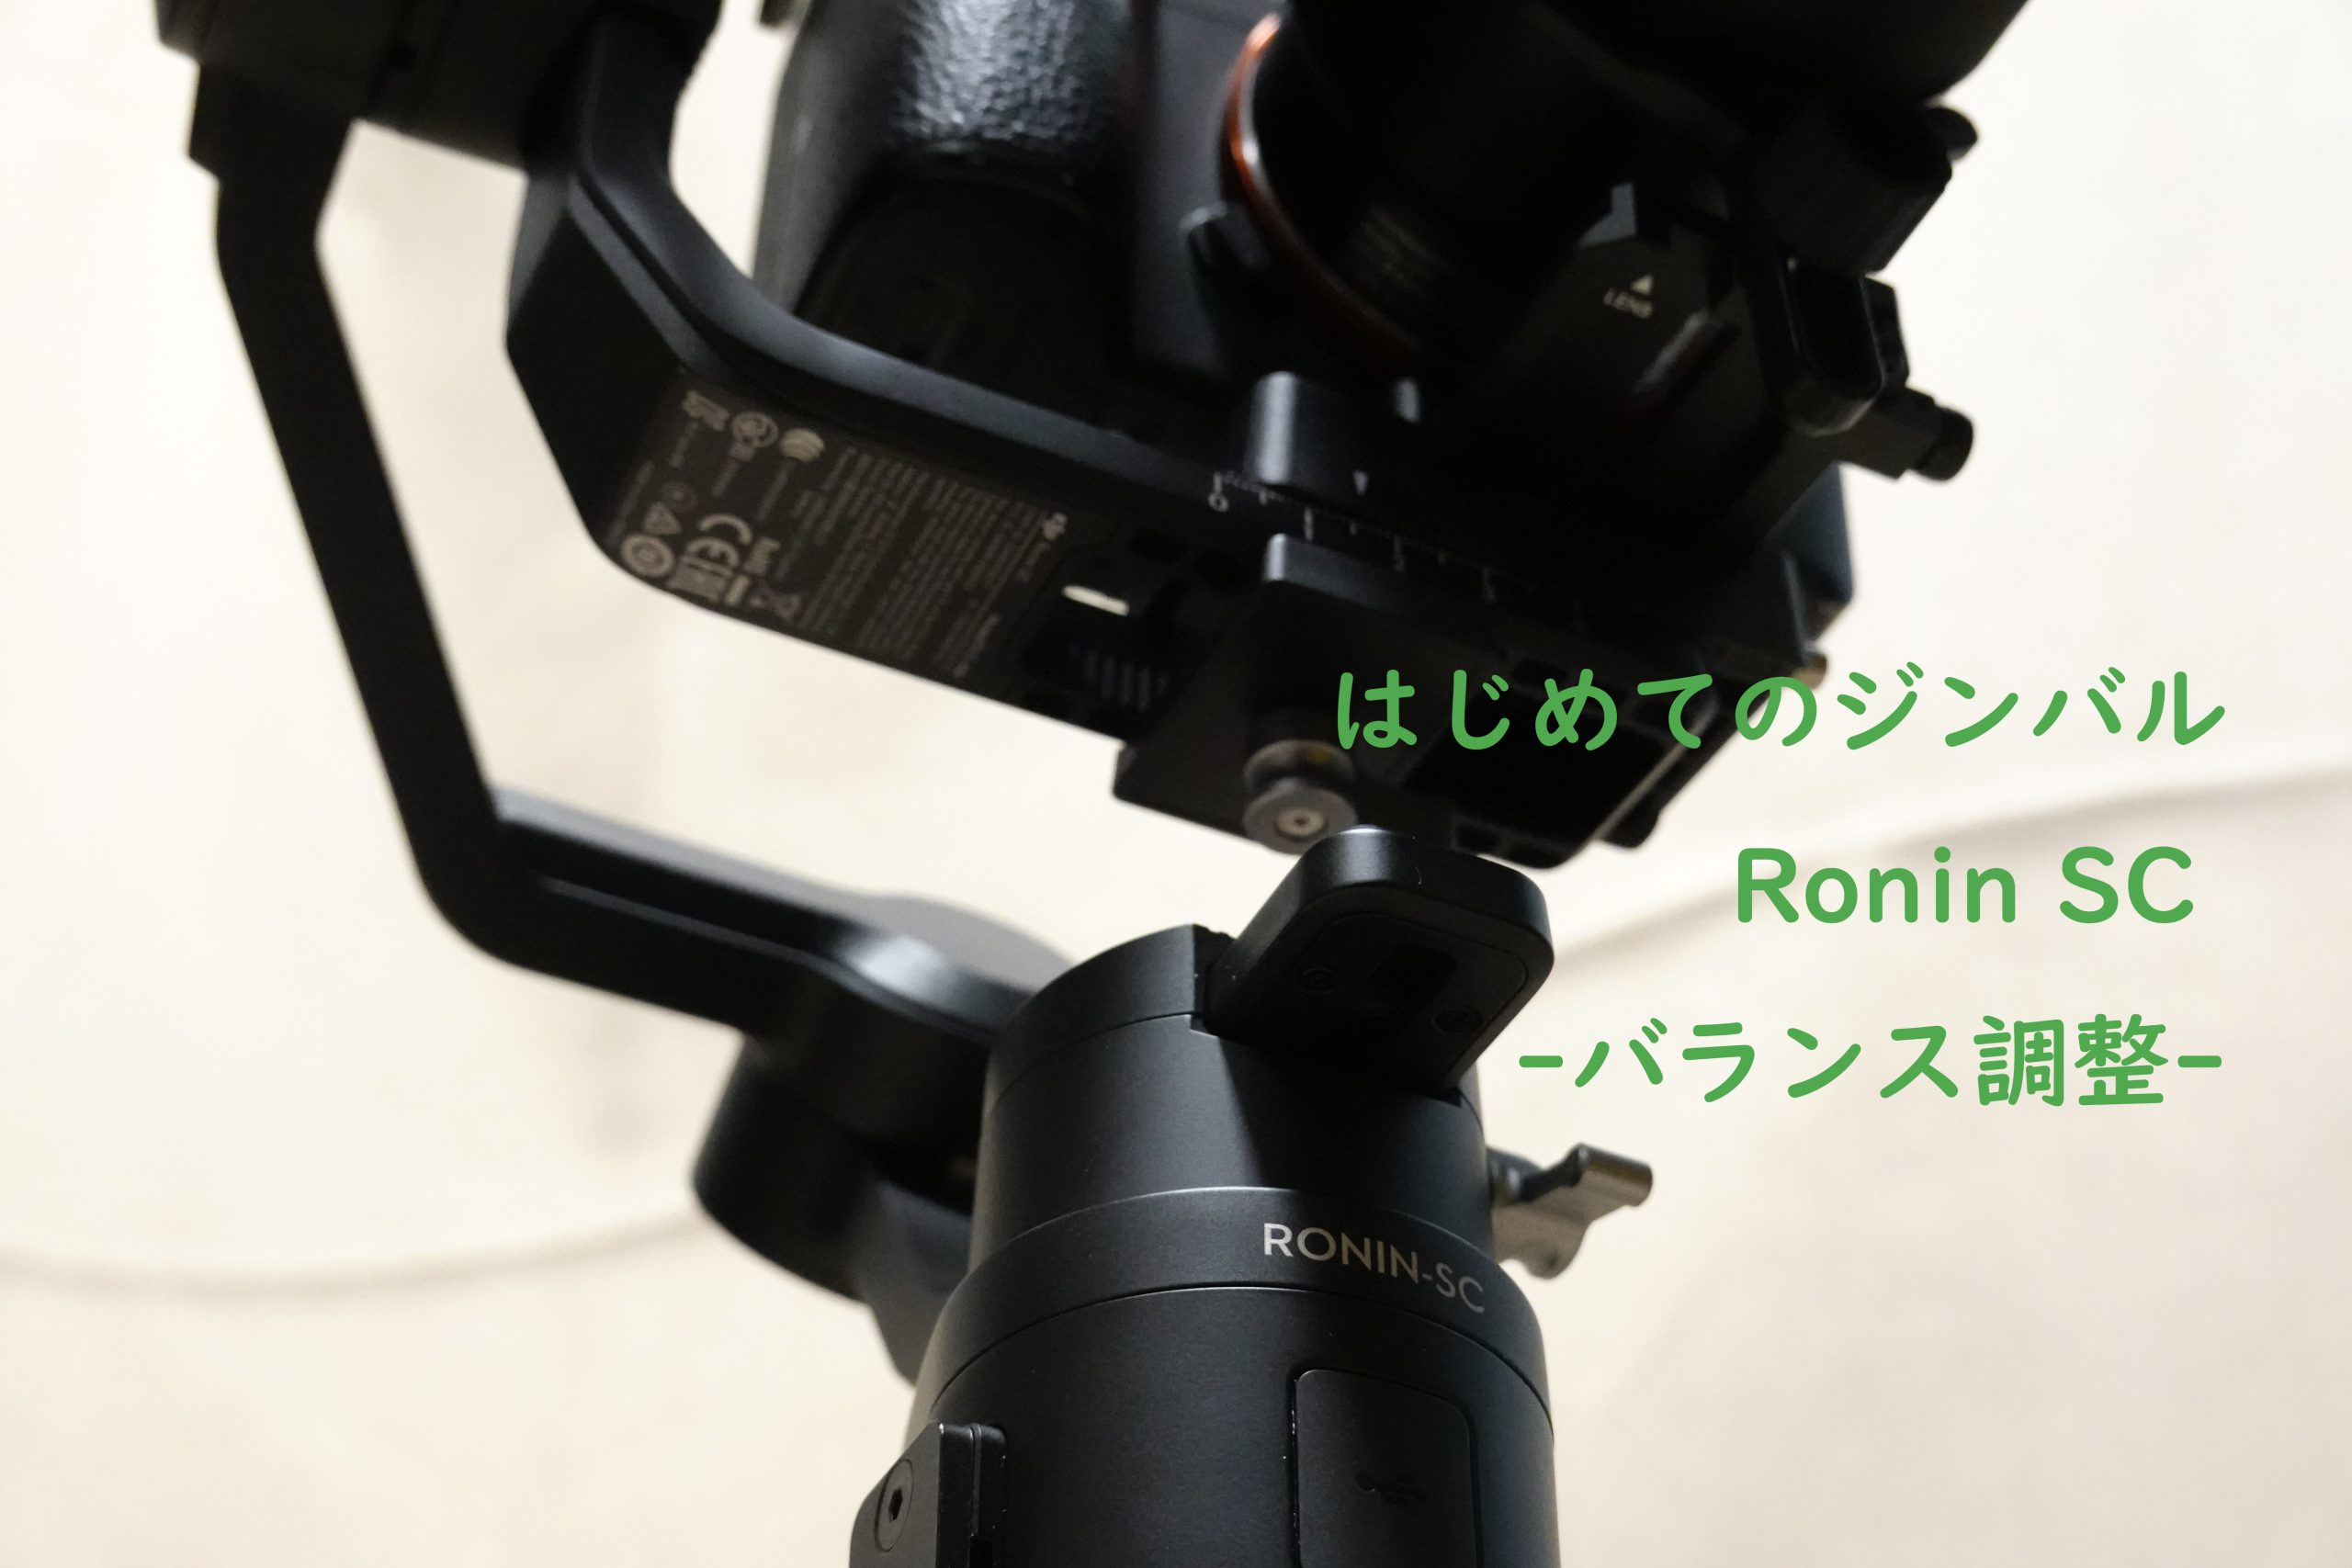 【DJI】はじめてのジンバル Ronin SC -バランス調整-